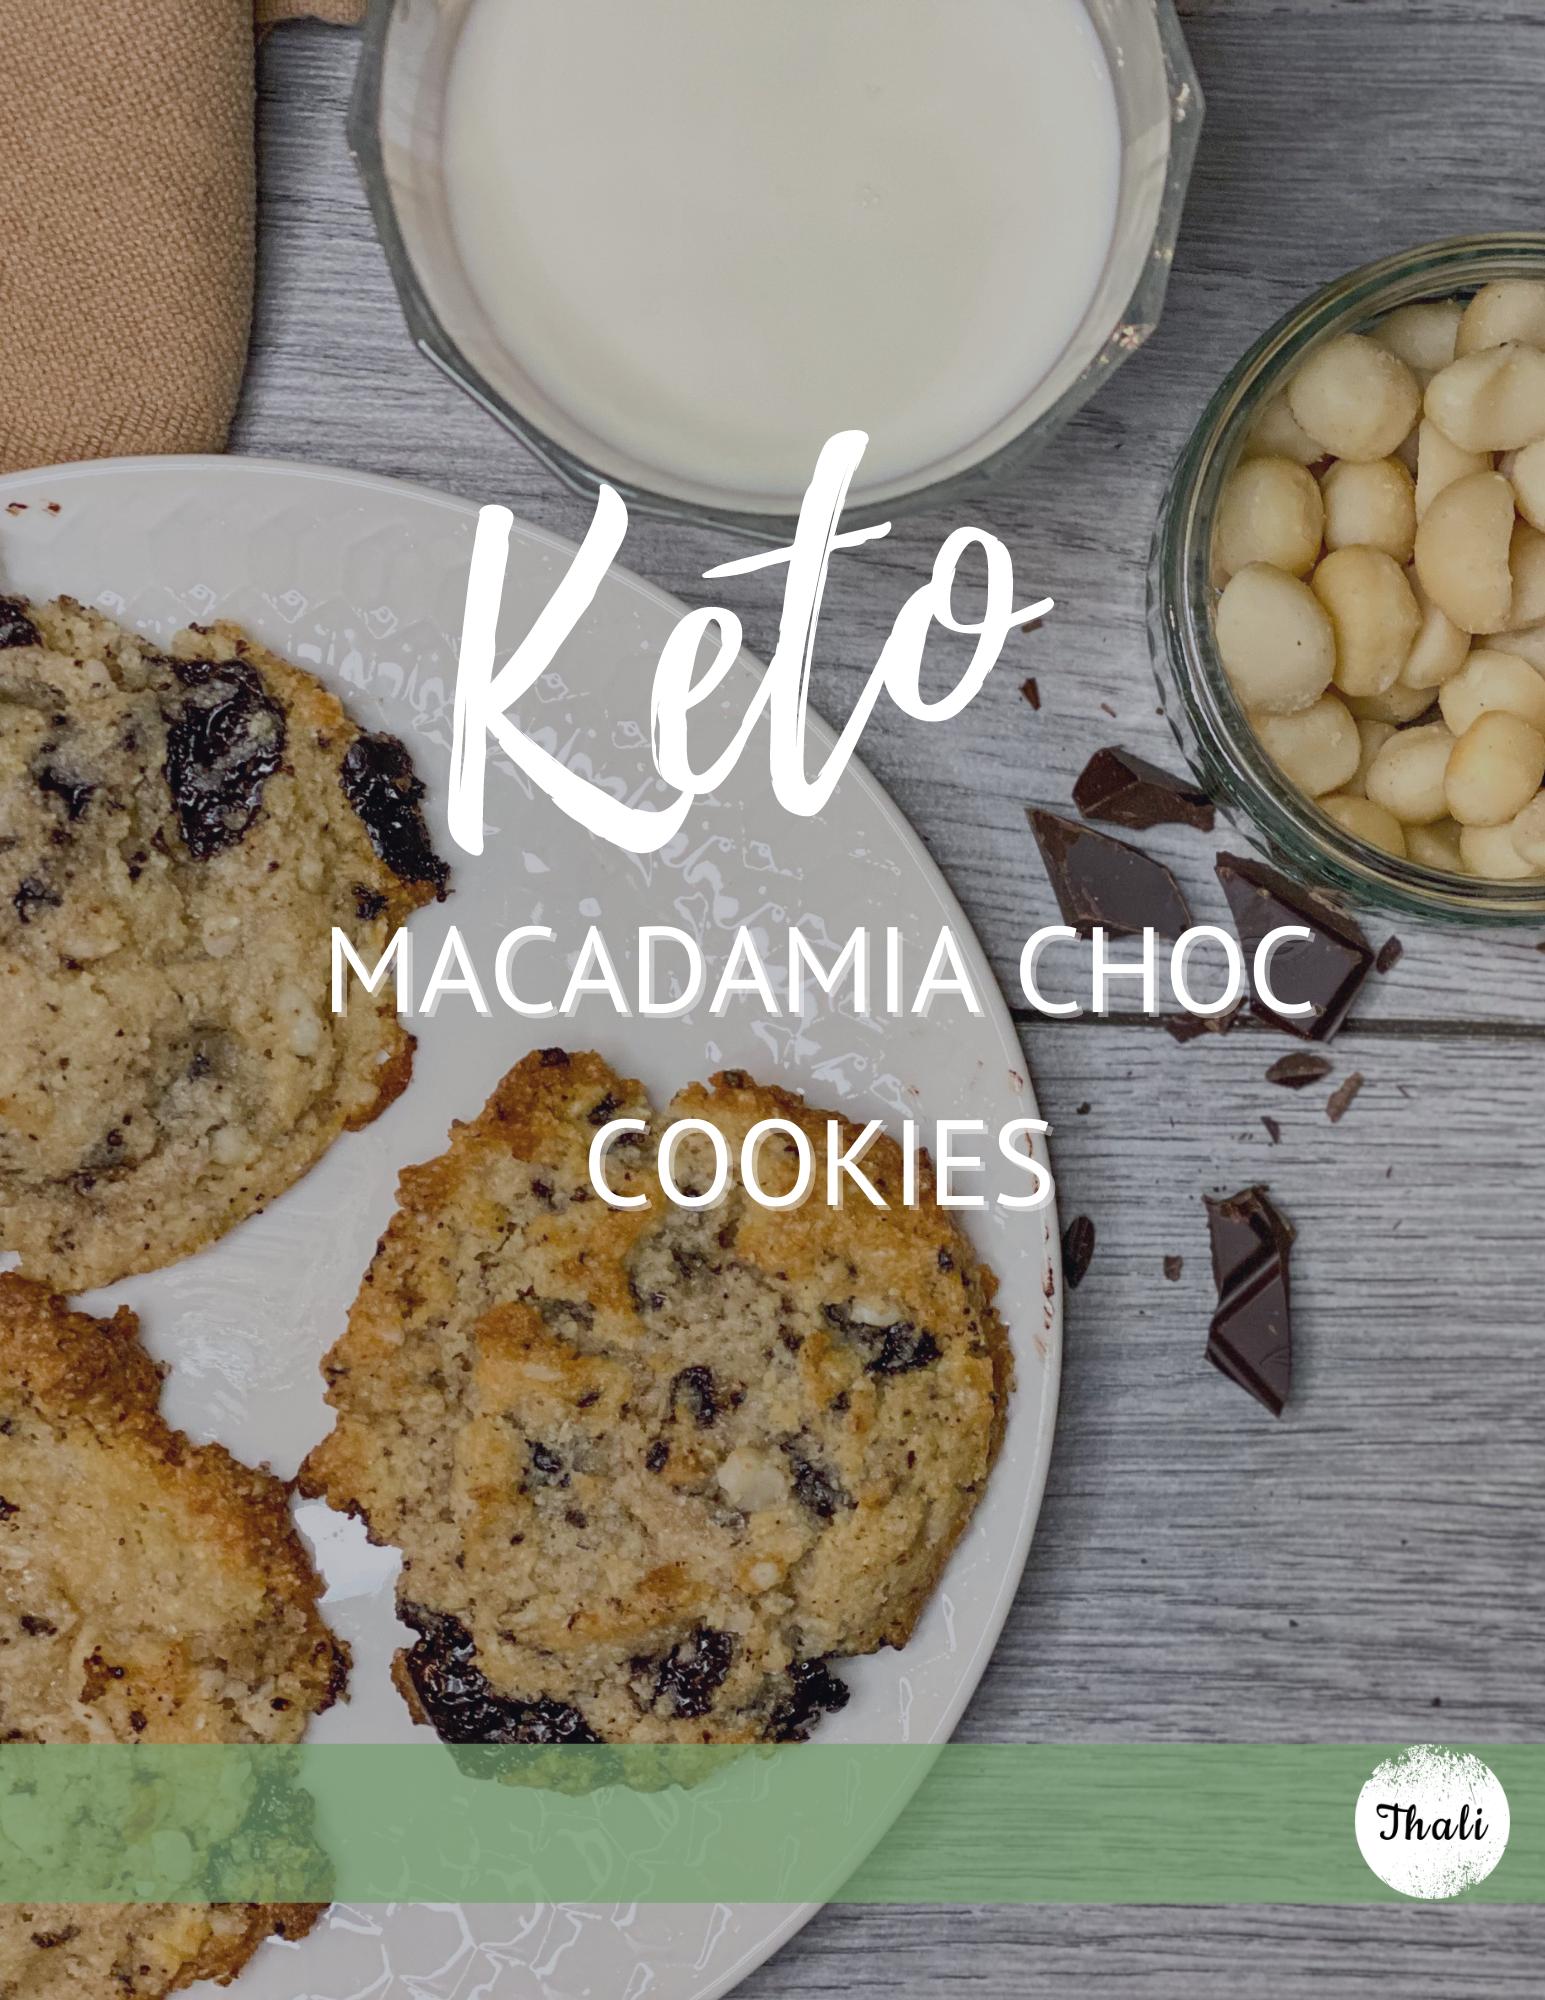 Keto macadamia nut dark choc cookies